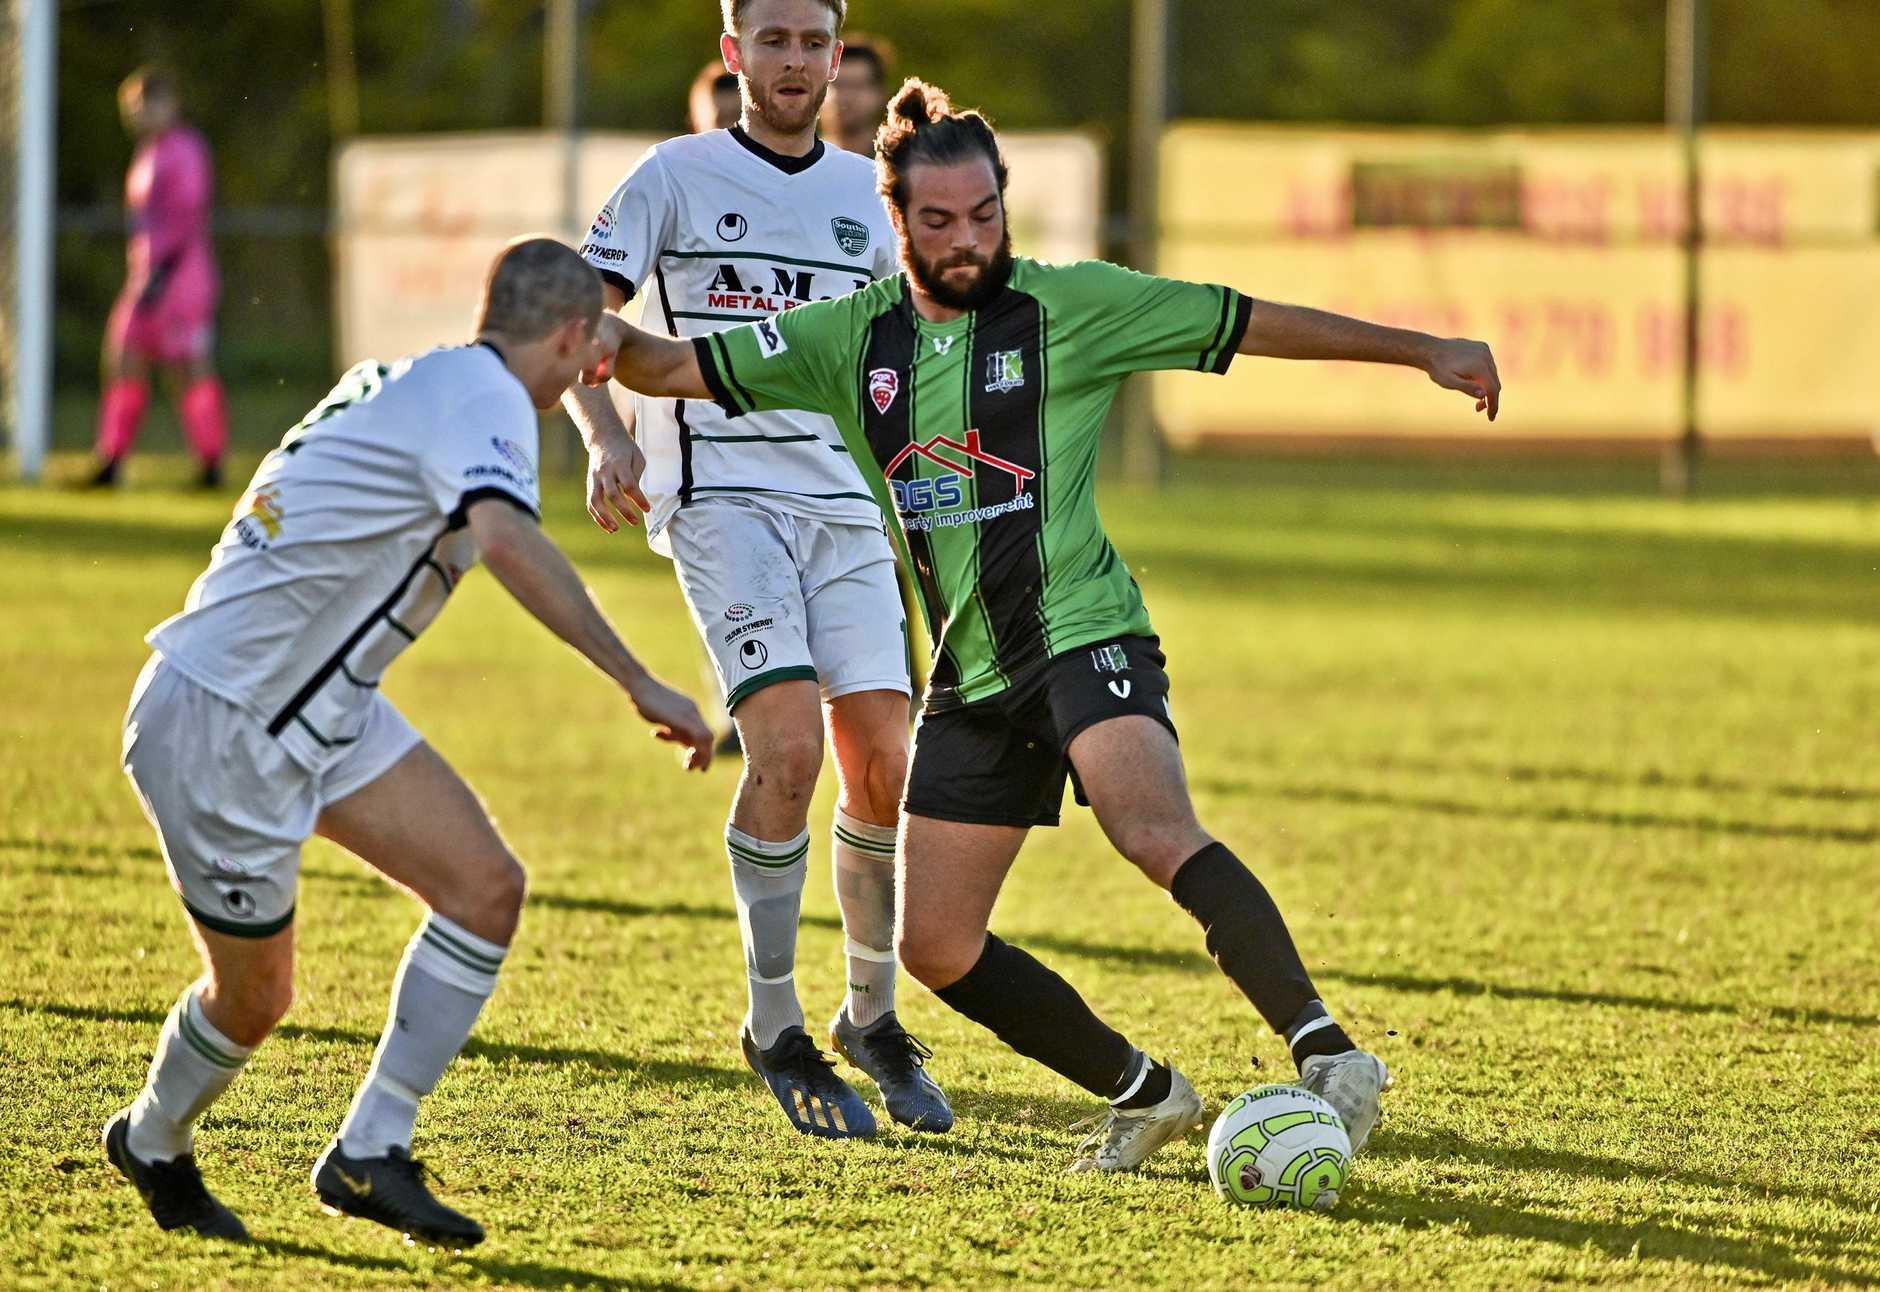 STRIKE WEAPON: Ipswich Knights striker Lachlan Munn can play a vital role in his team's bid to reach the Queensland Premier League grand final this weekend.